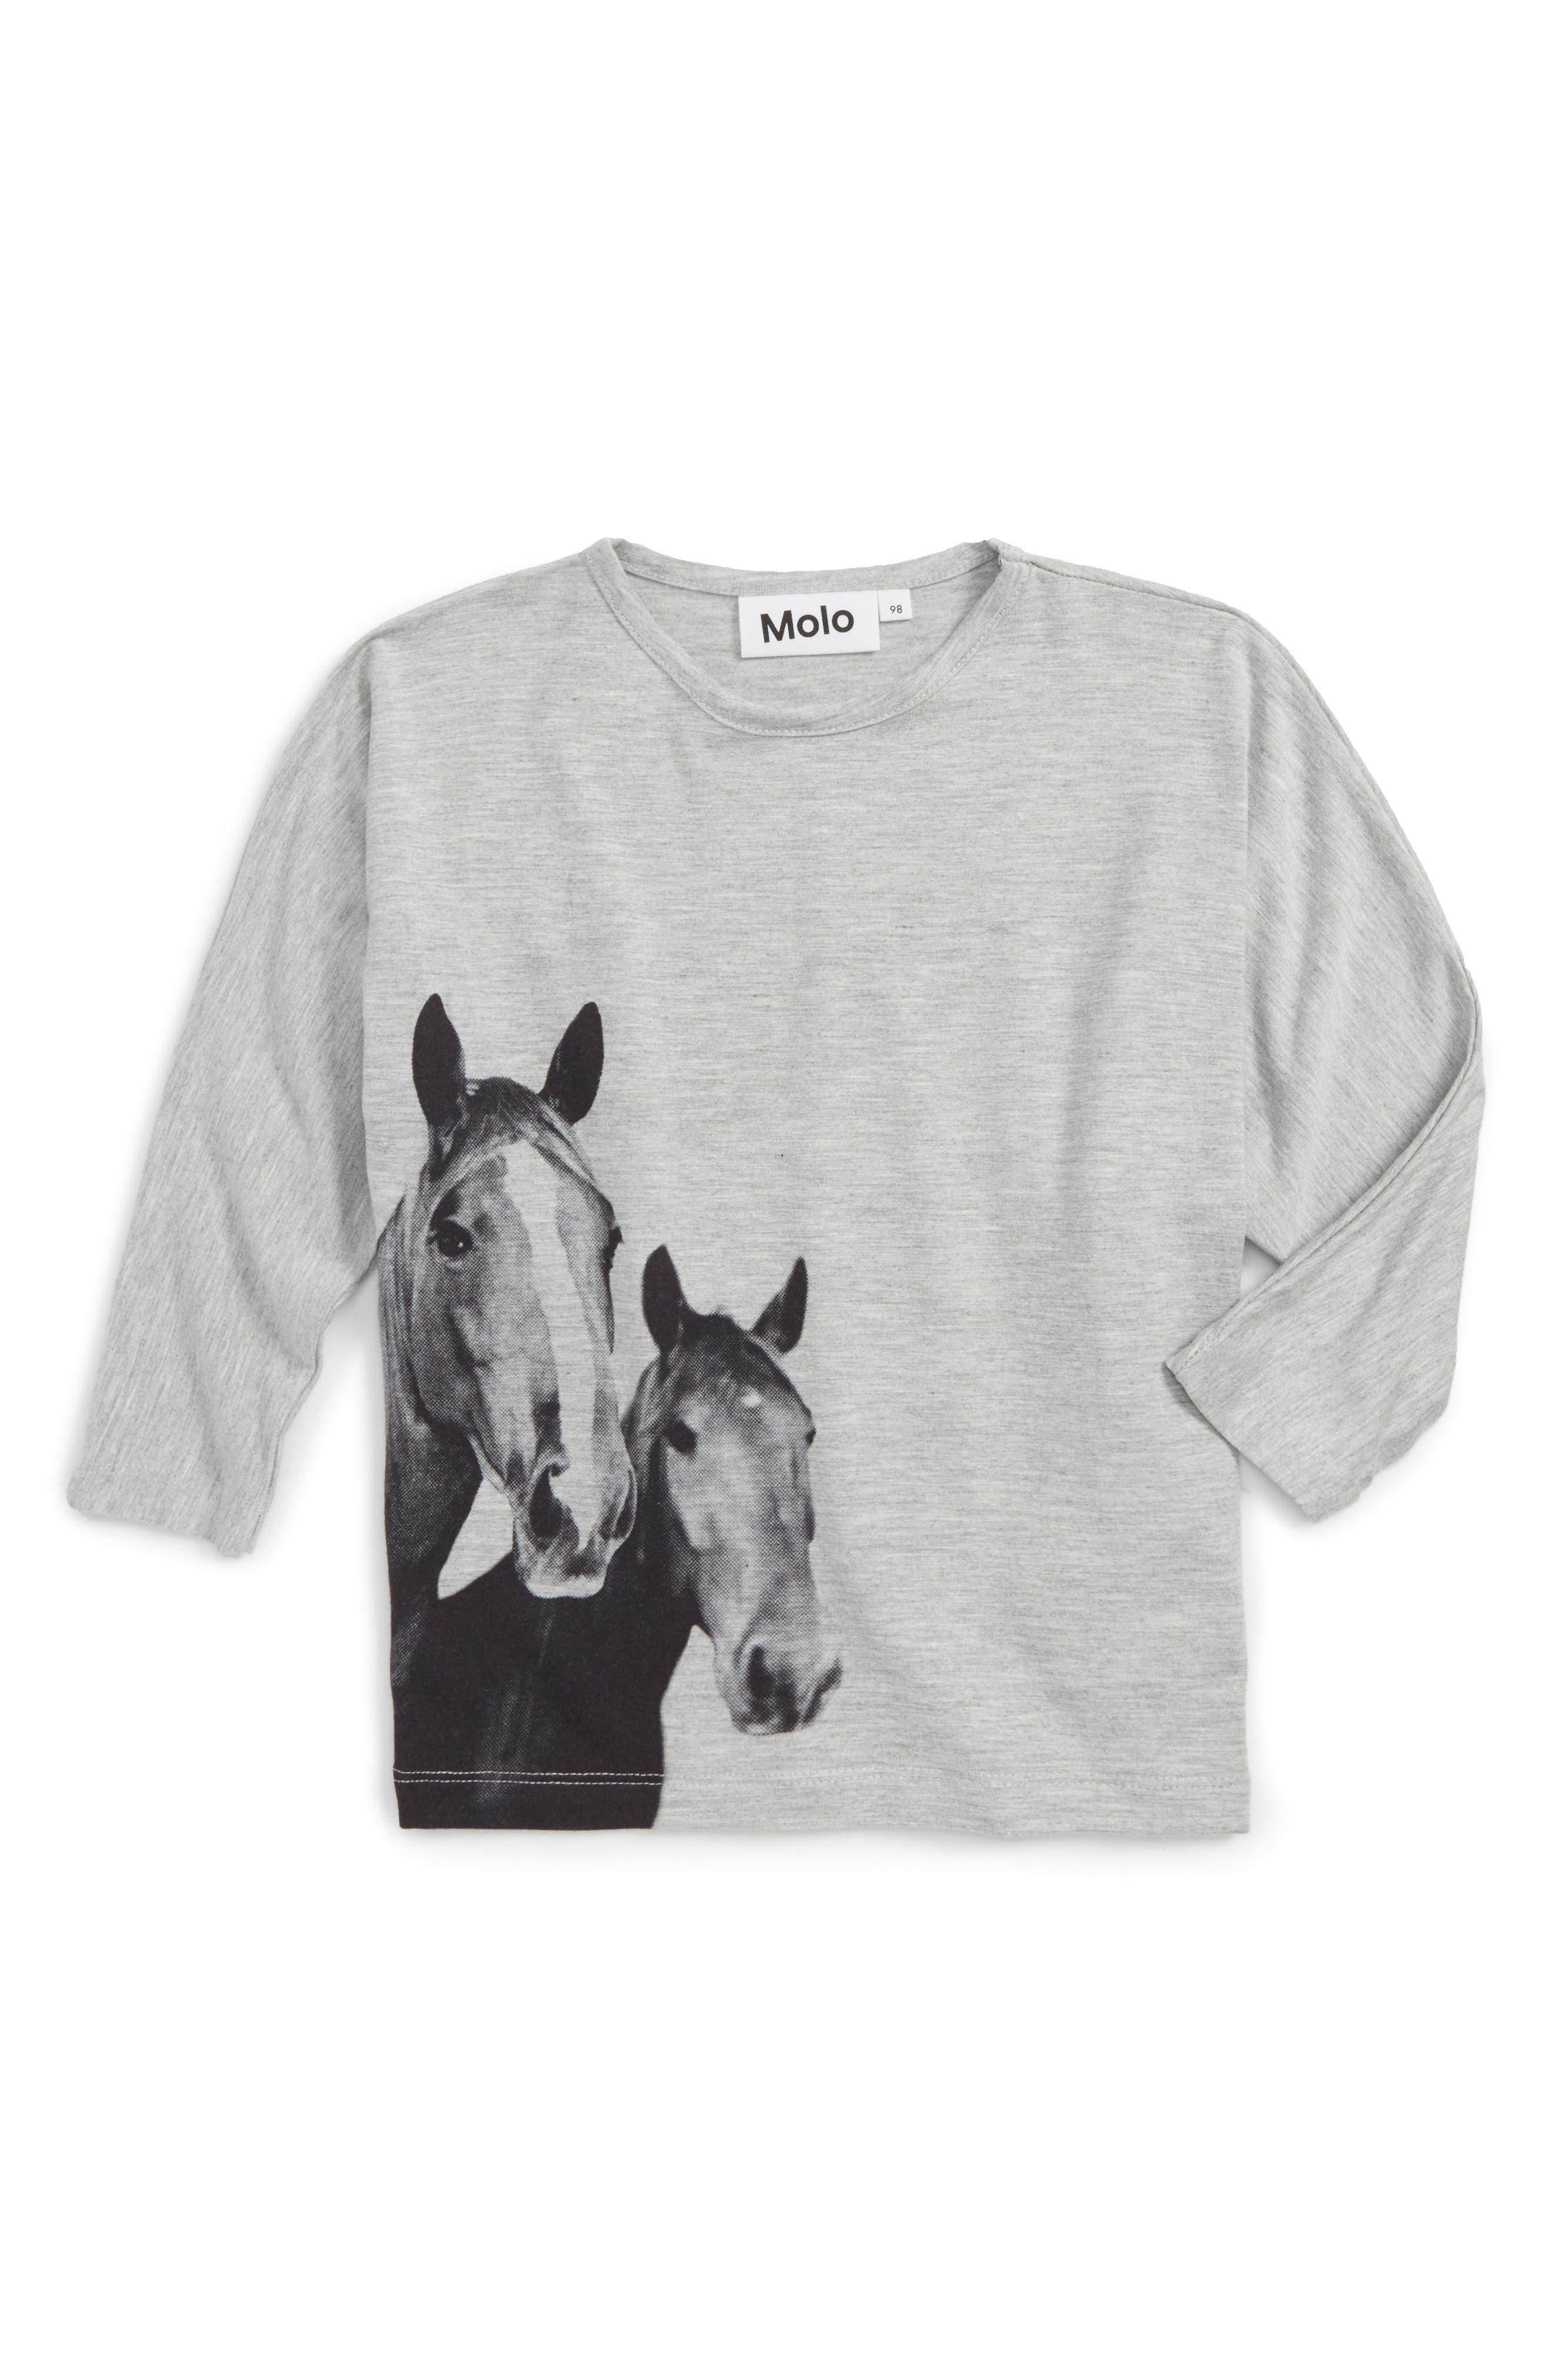 MOLO Rosey Horse Graphic Tee